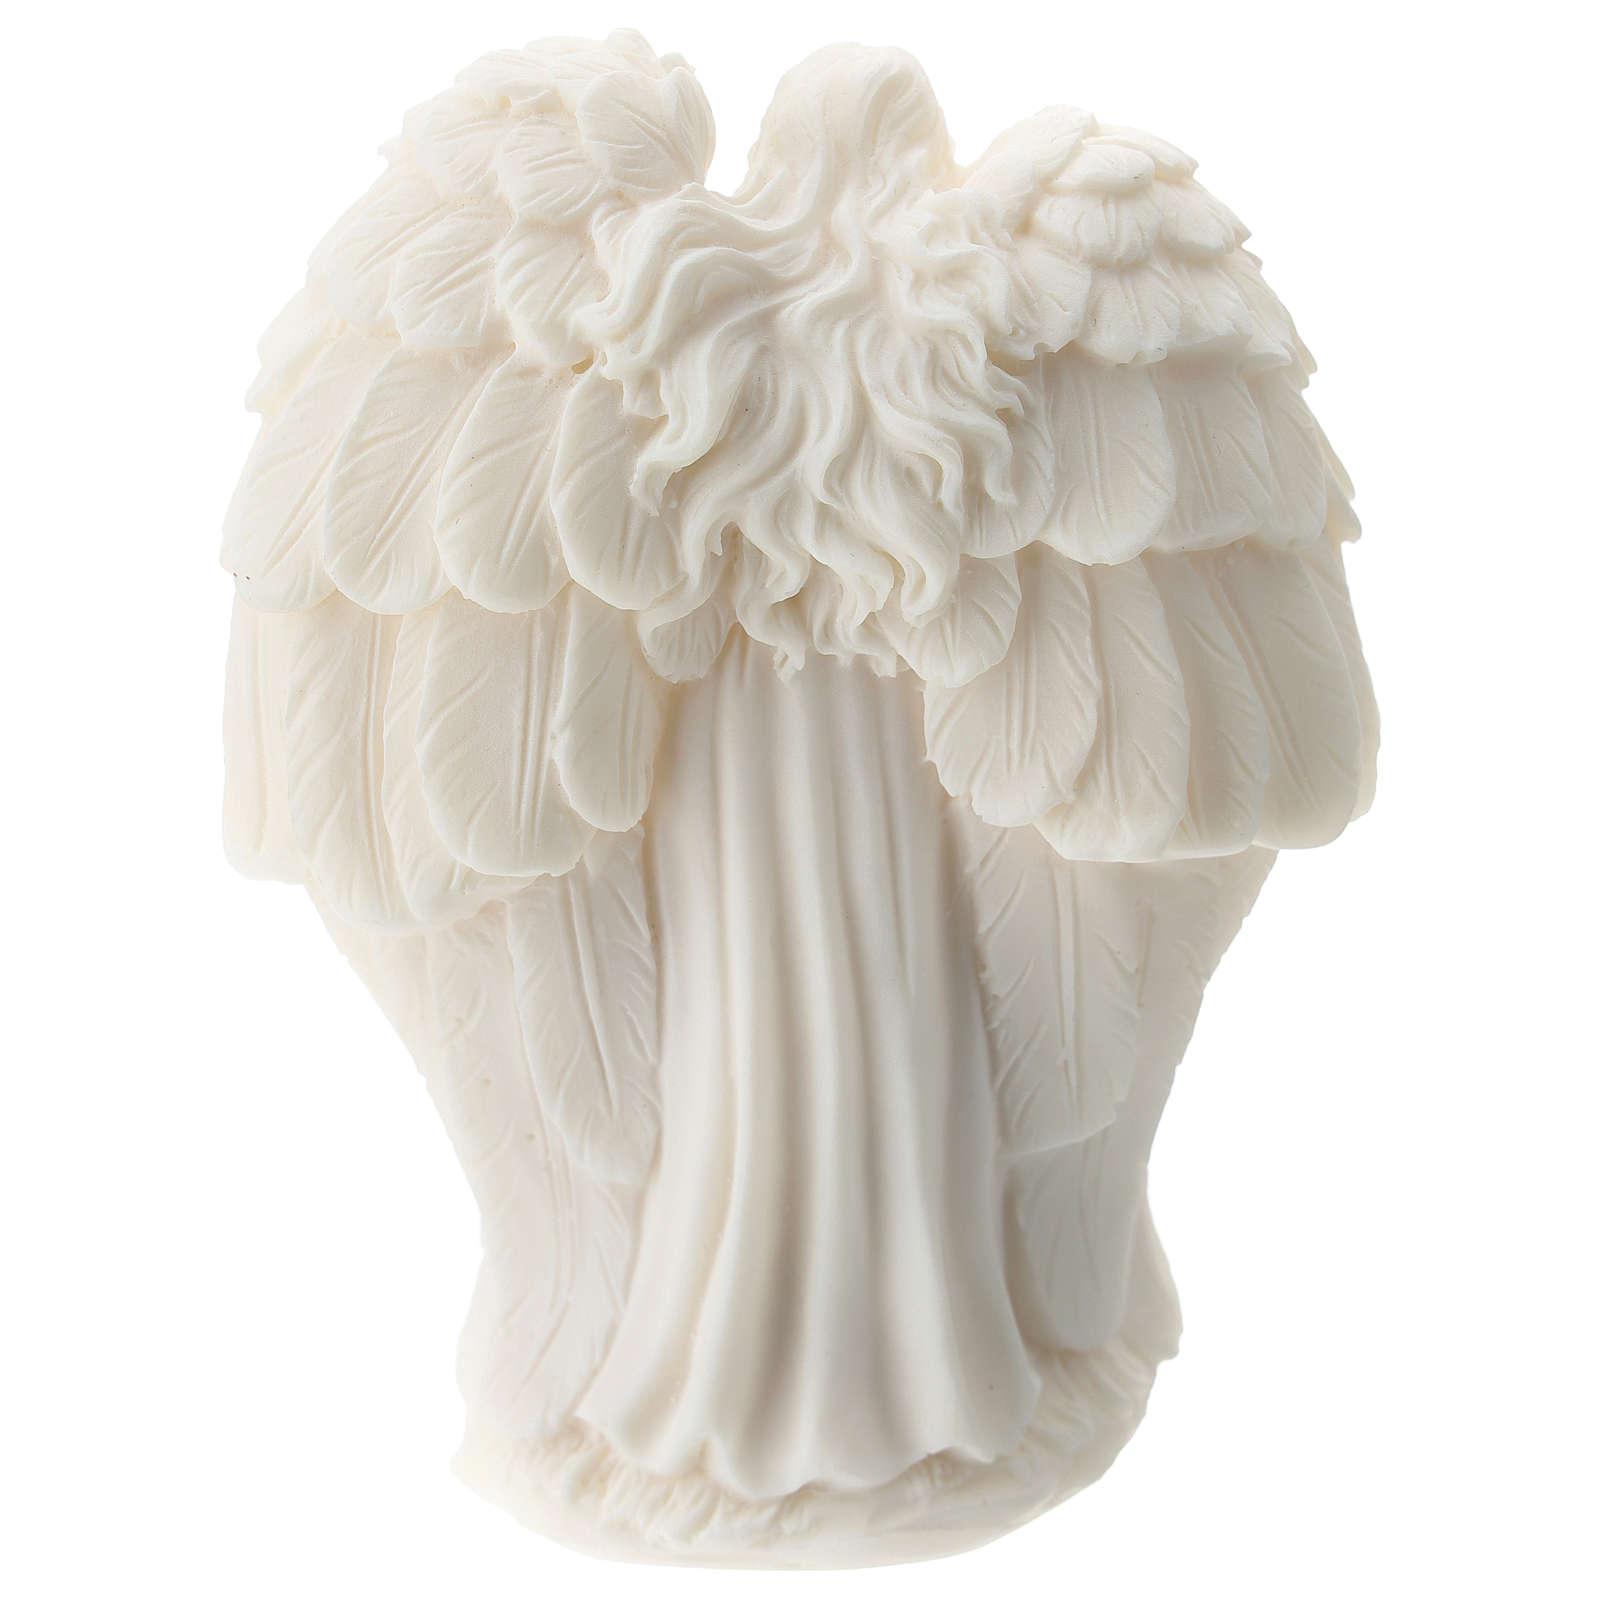 Sacra Famiglia con Angelo resina bianca 10 cm 3